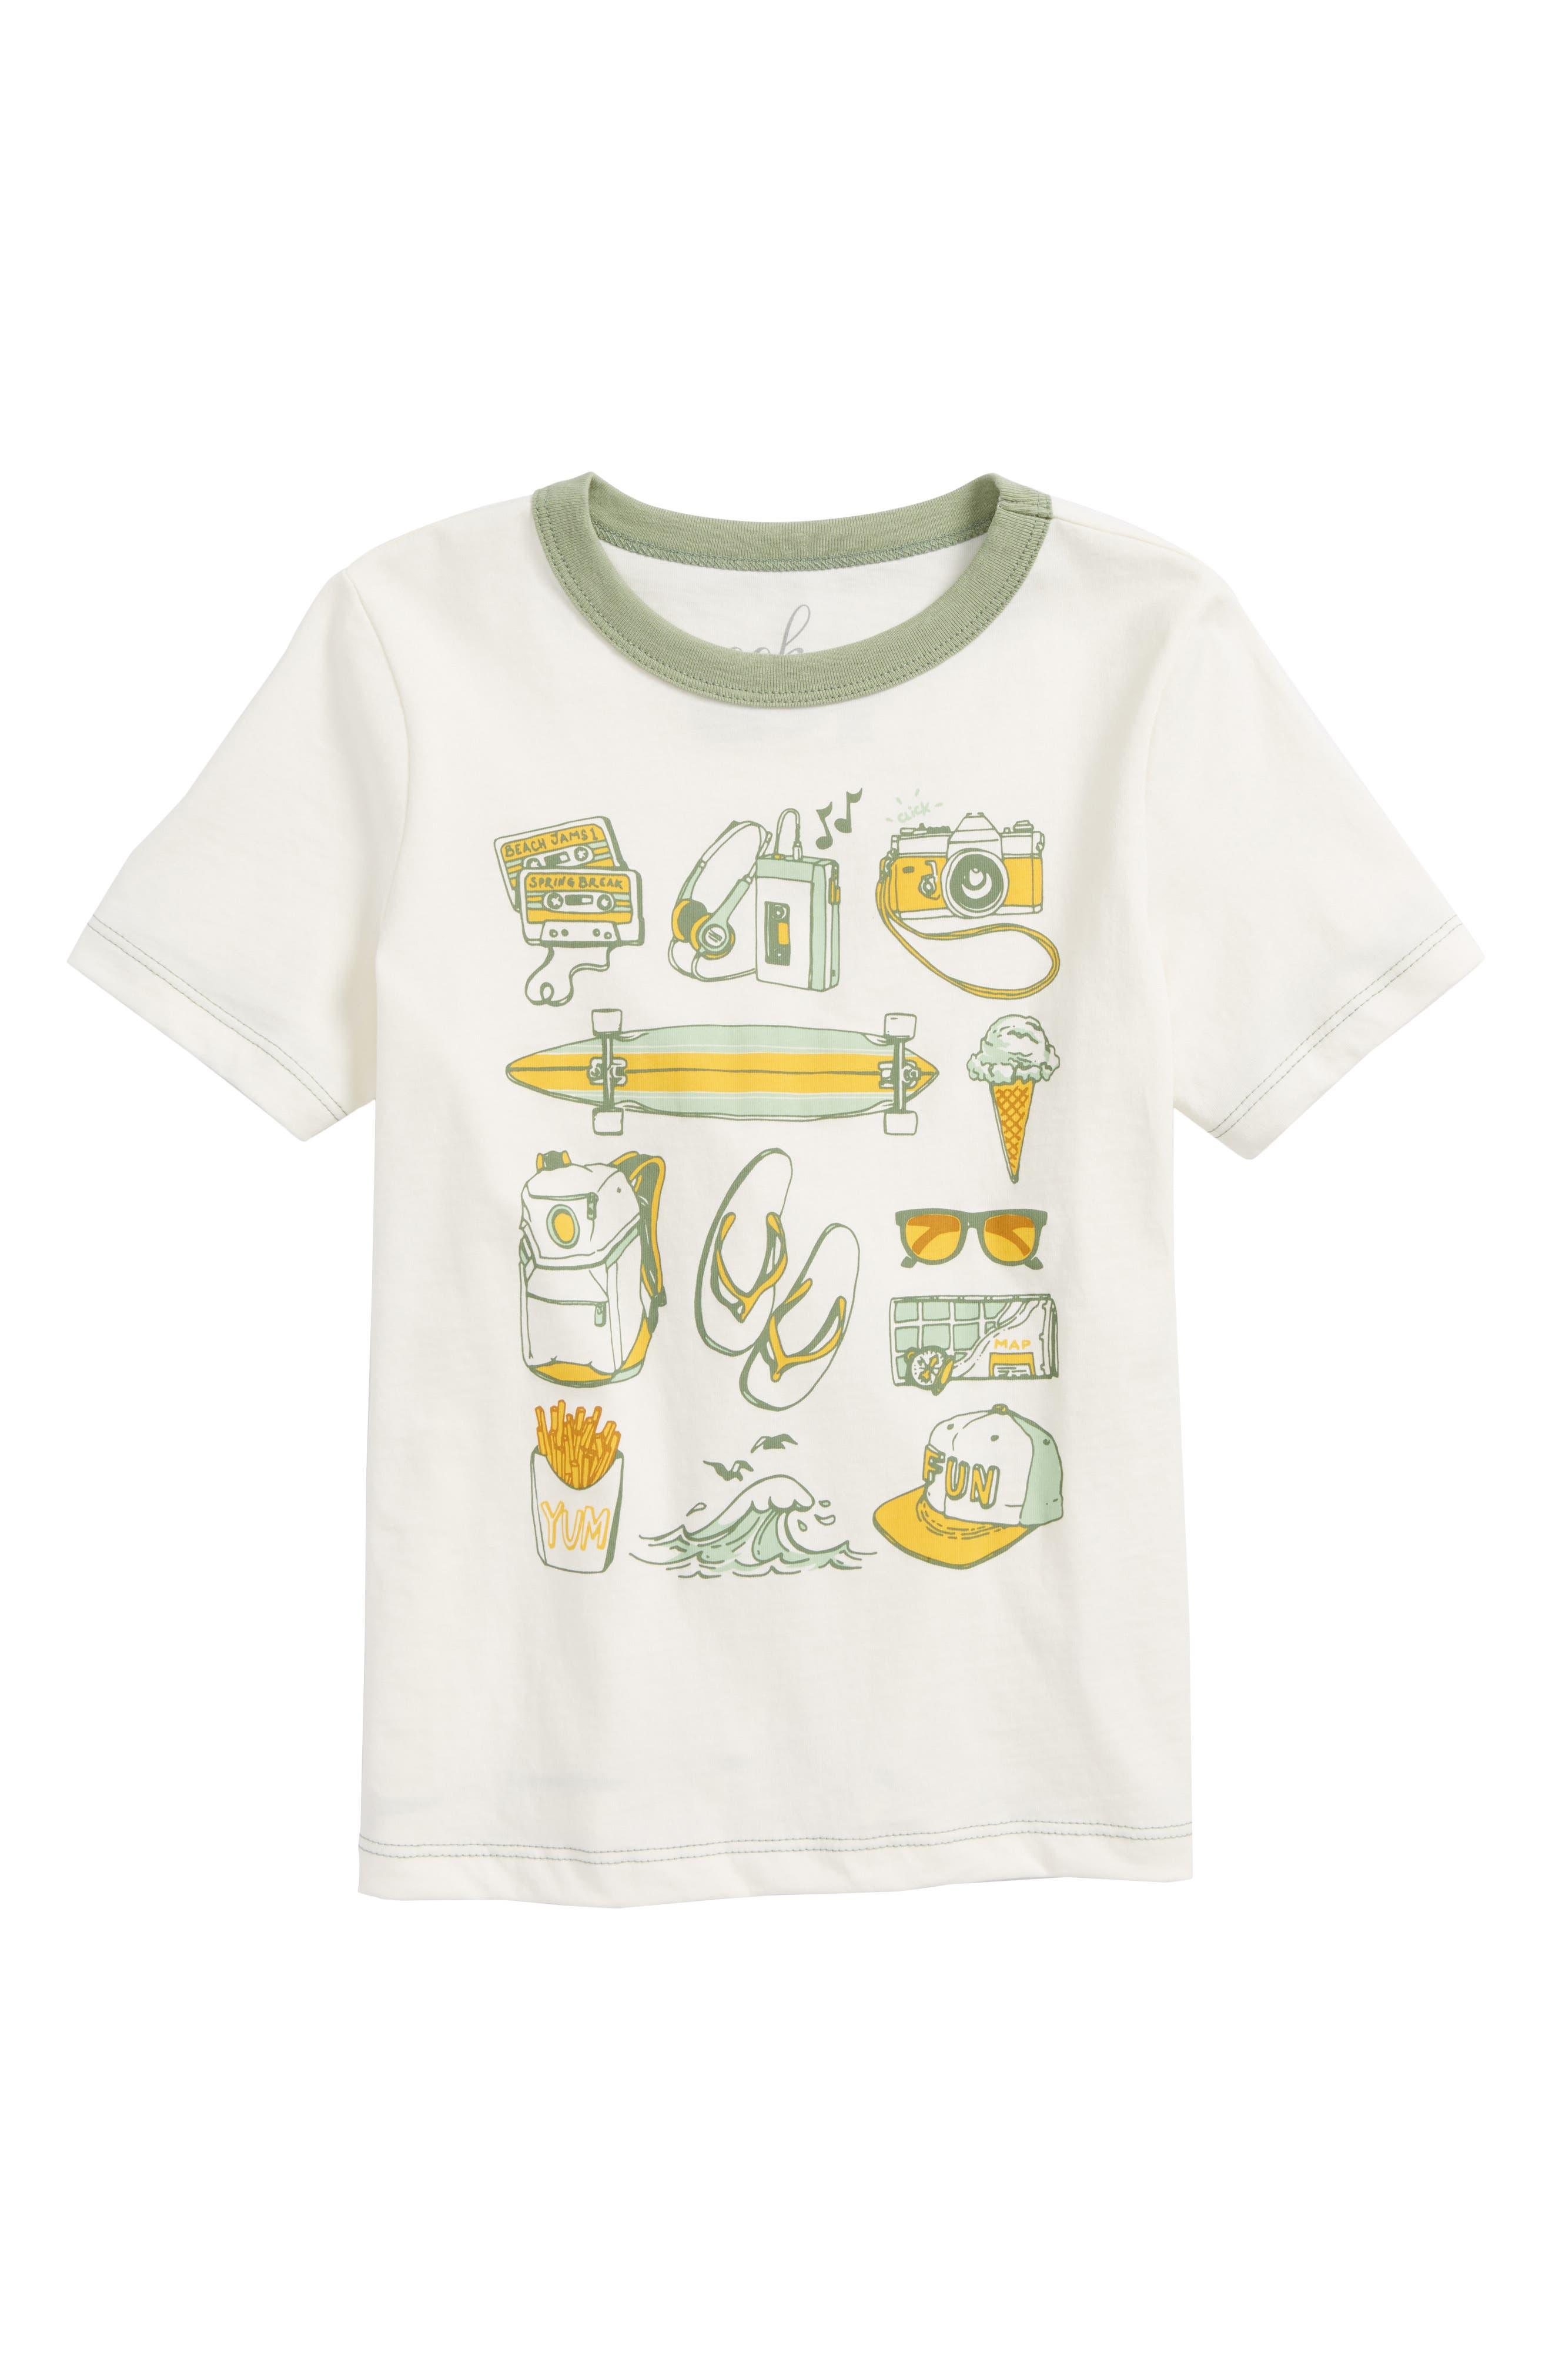 Spring Break Checklist T-Shirt,                             Main thumbnail 1, color,                             Ivory